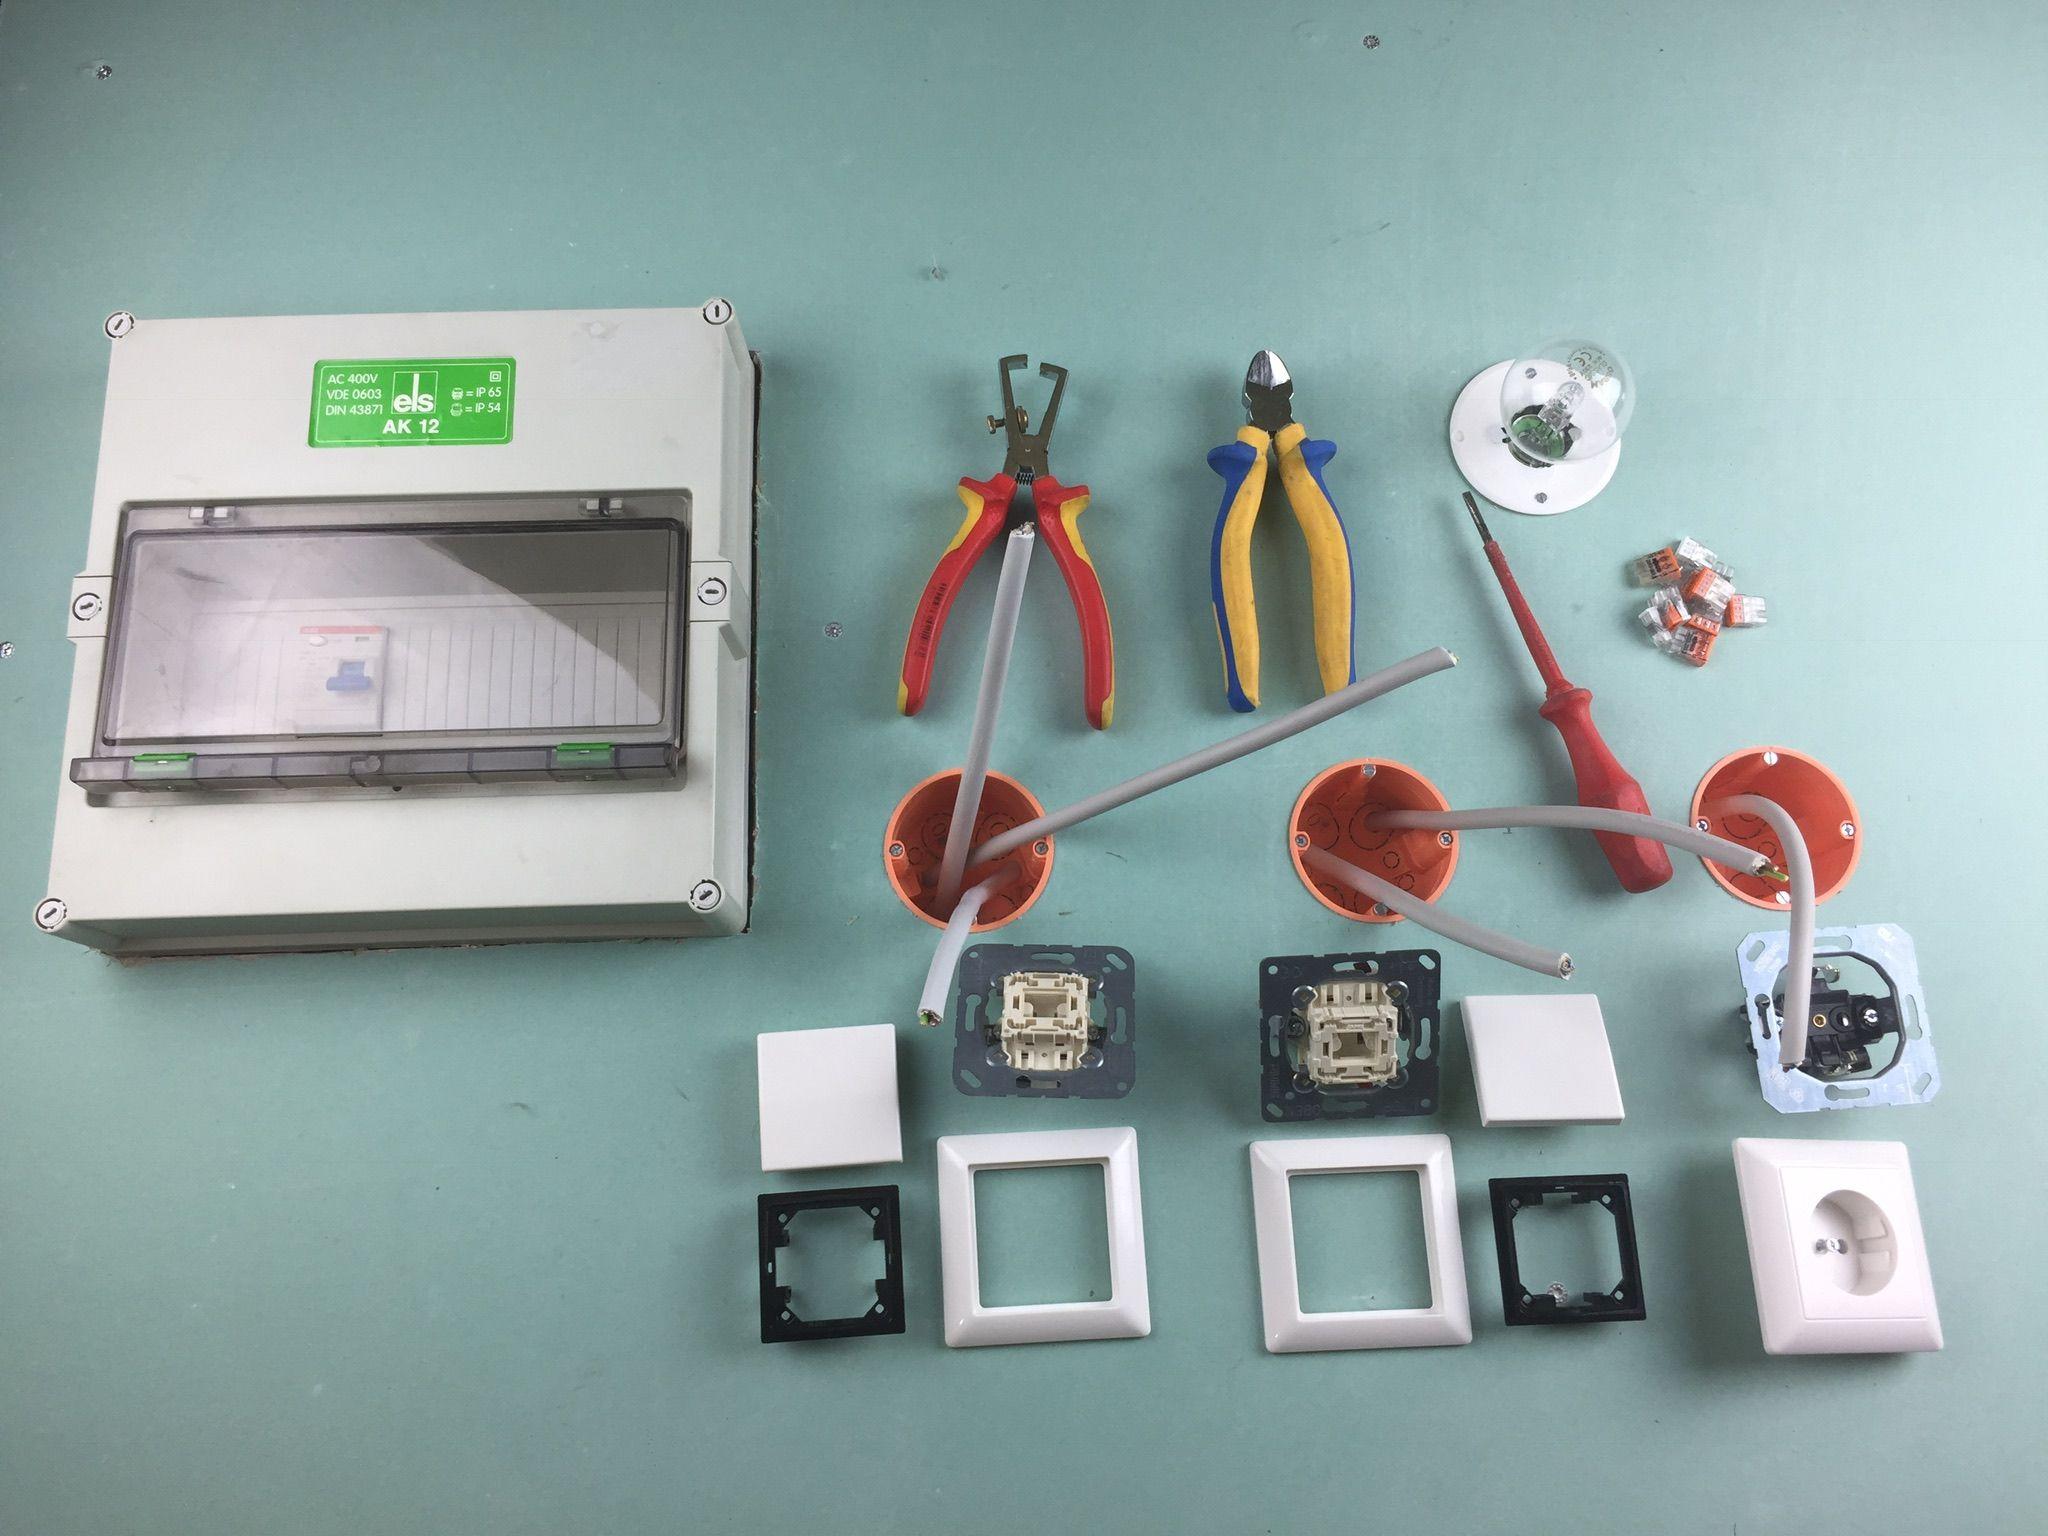 Elektroinstallation Anleitungen | Elektroinstallation | Pinterest ...